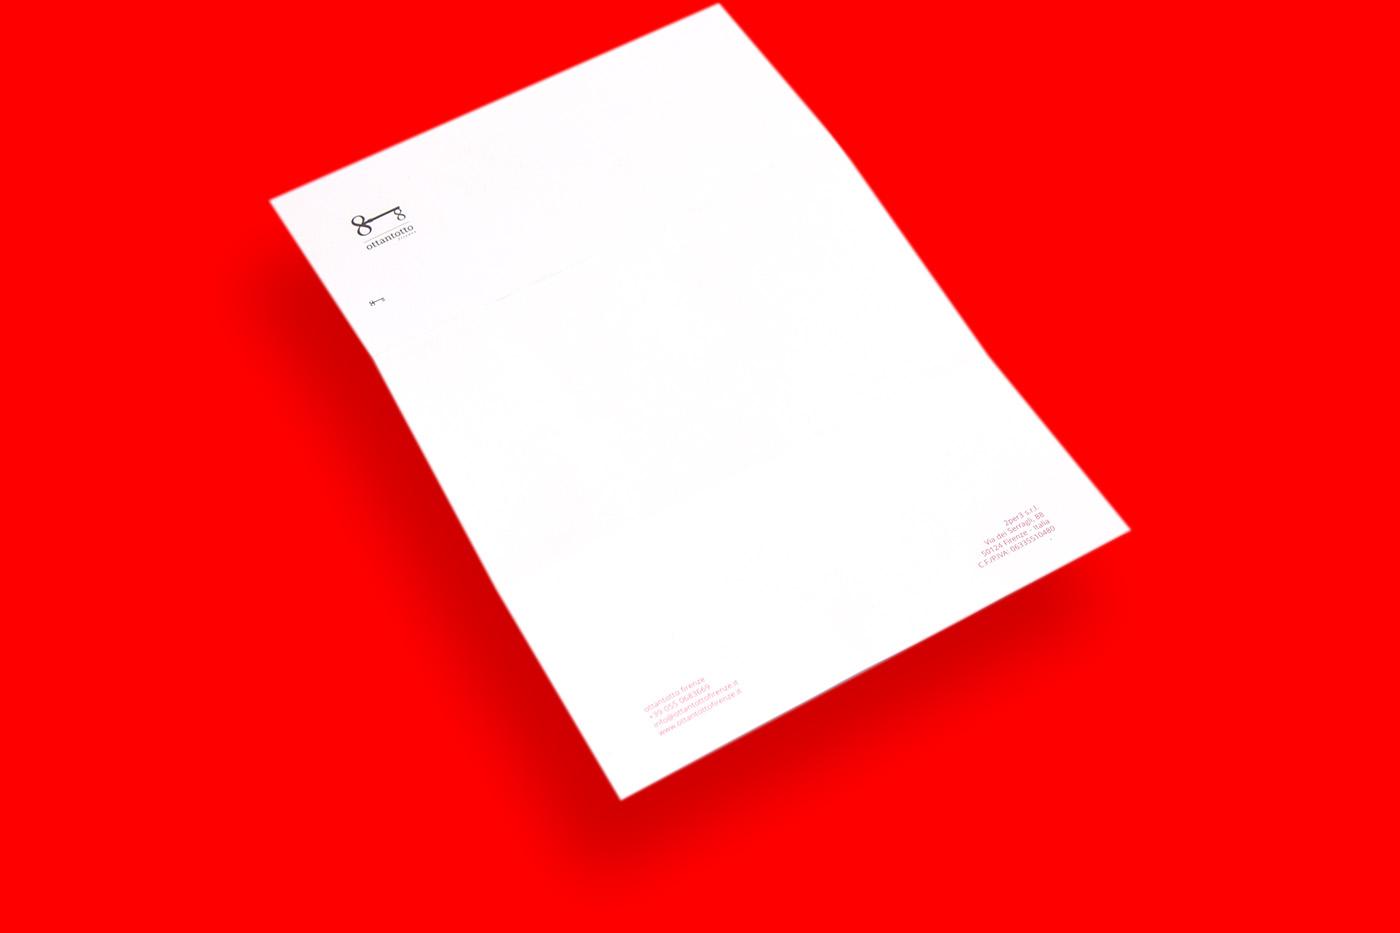 elegance detail design Logotype Printing Website business card letterhead menu envelope